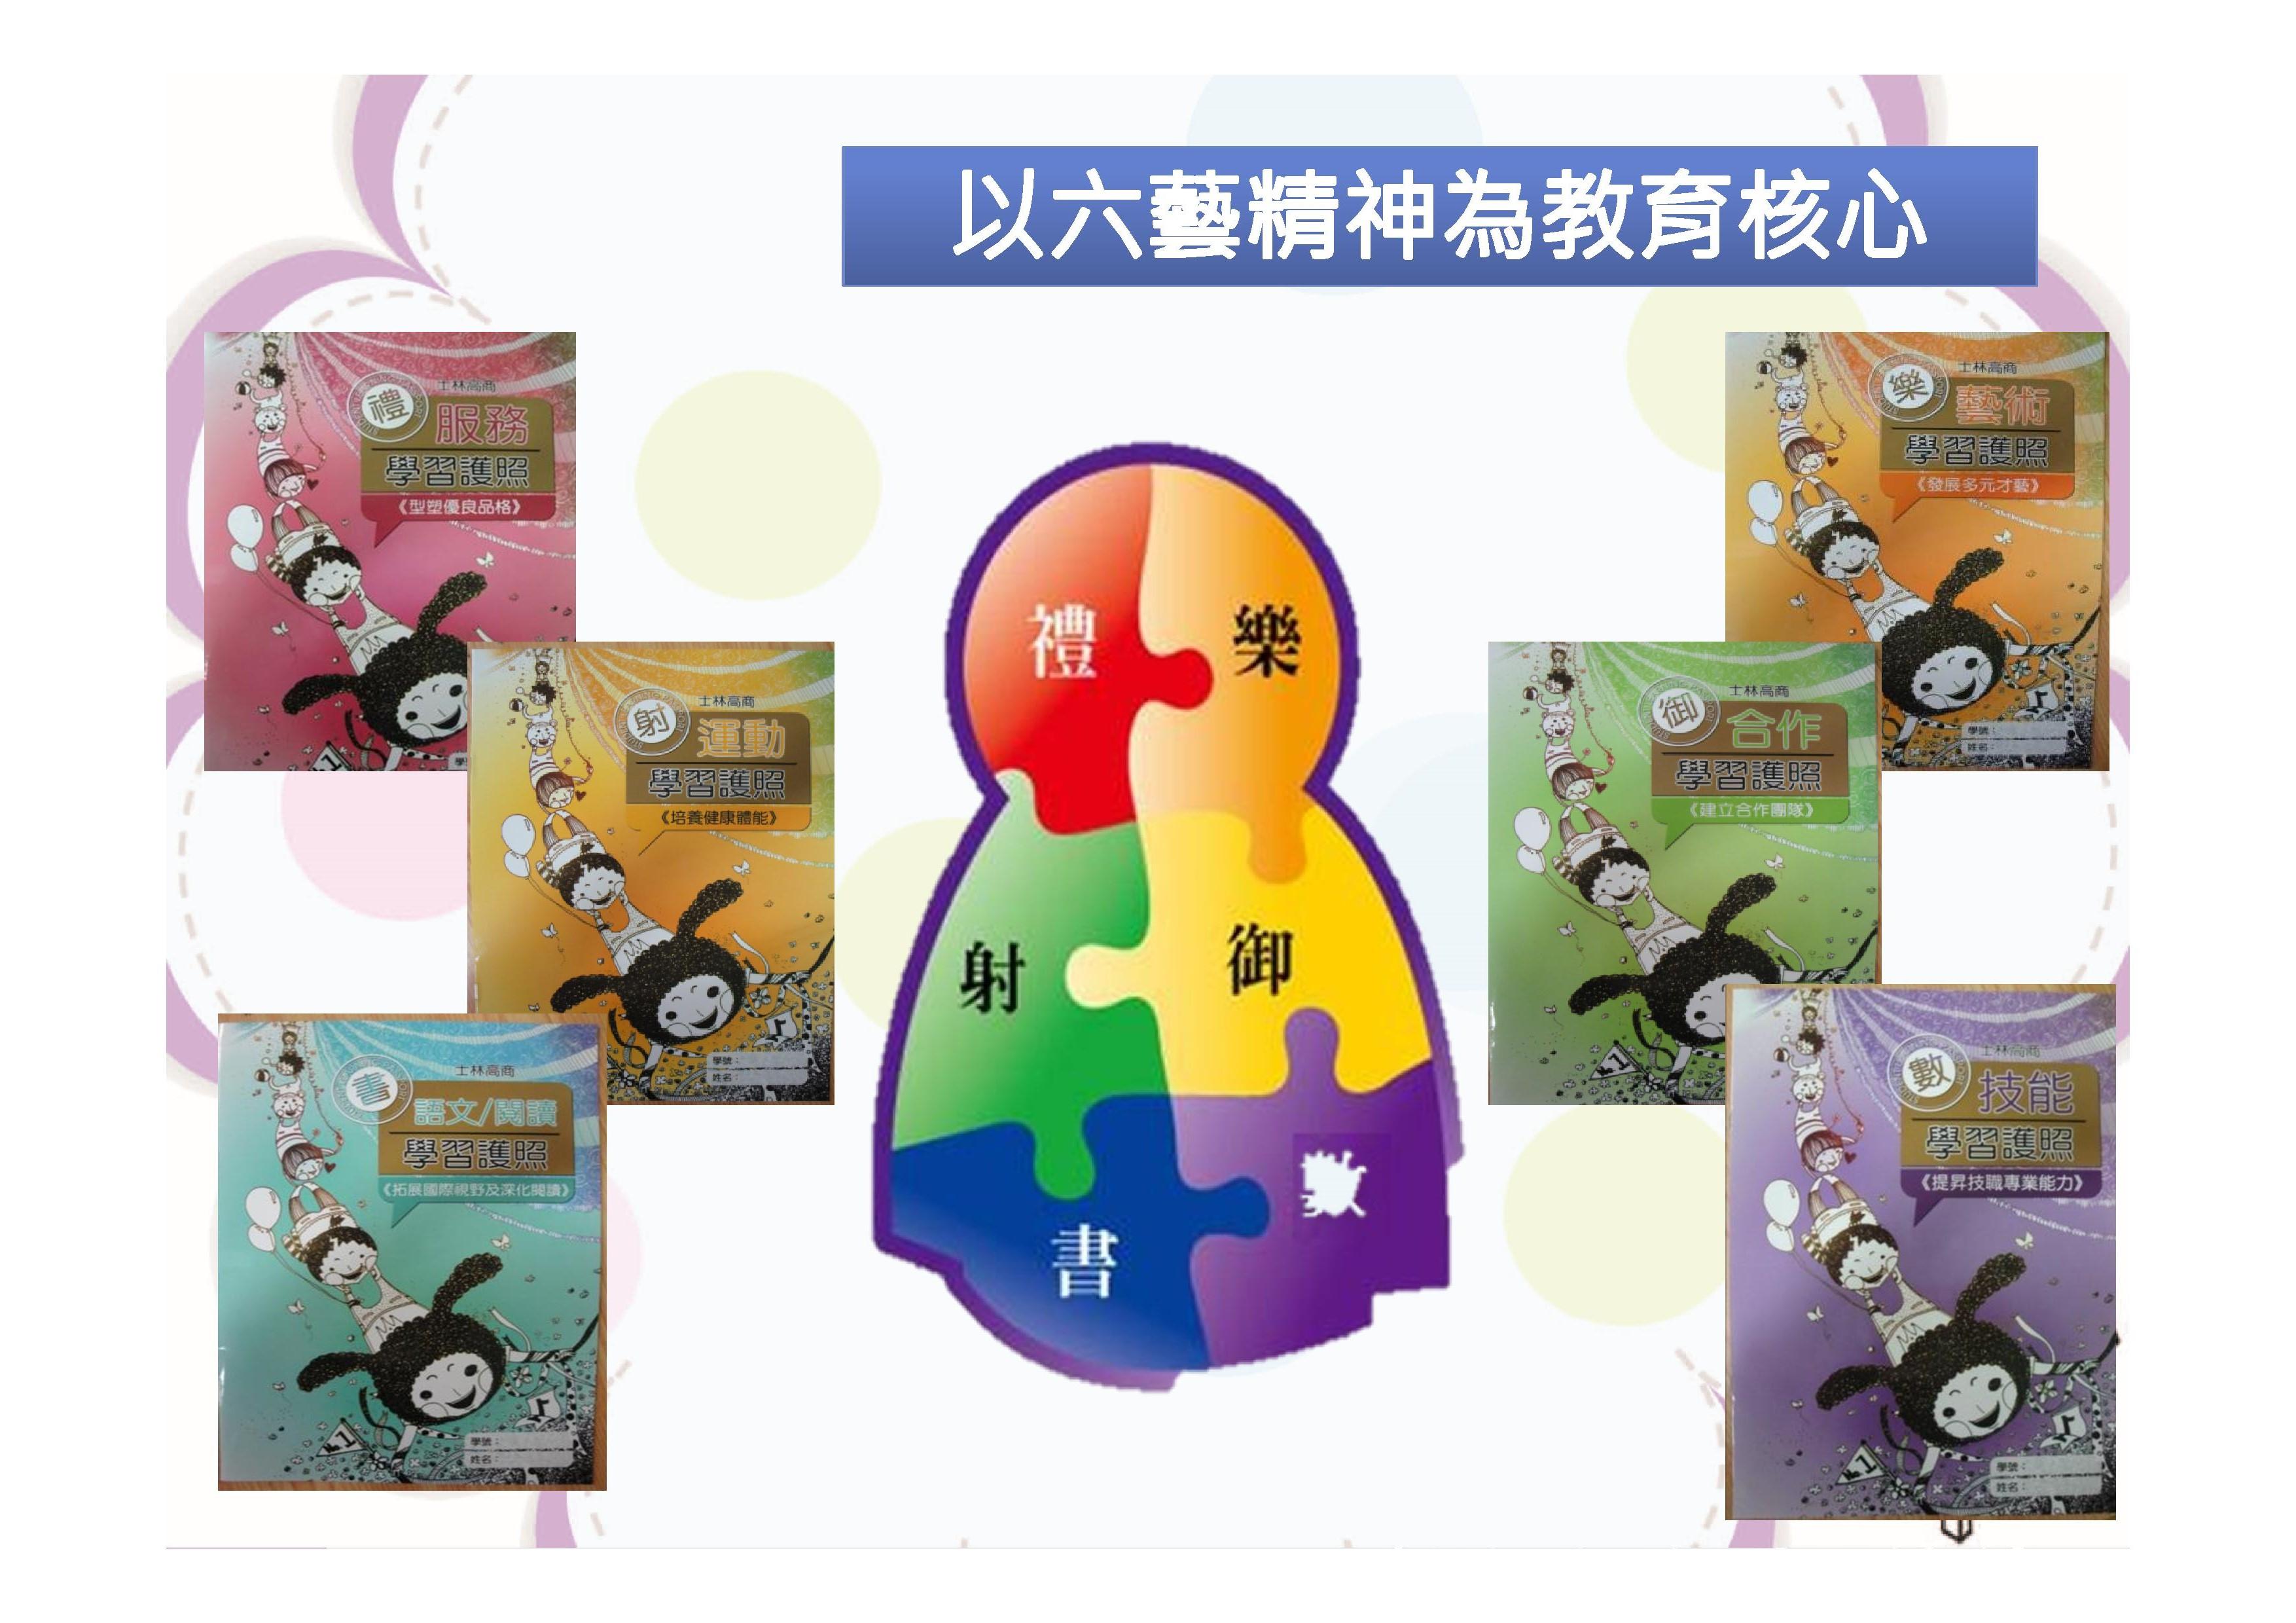 Microsoft PowerPoint - 技職教育暨士商簡介.pptx00029